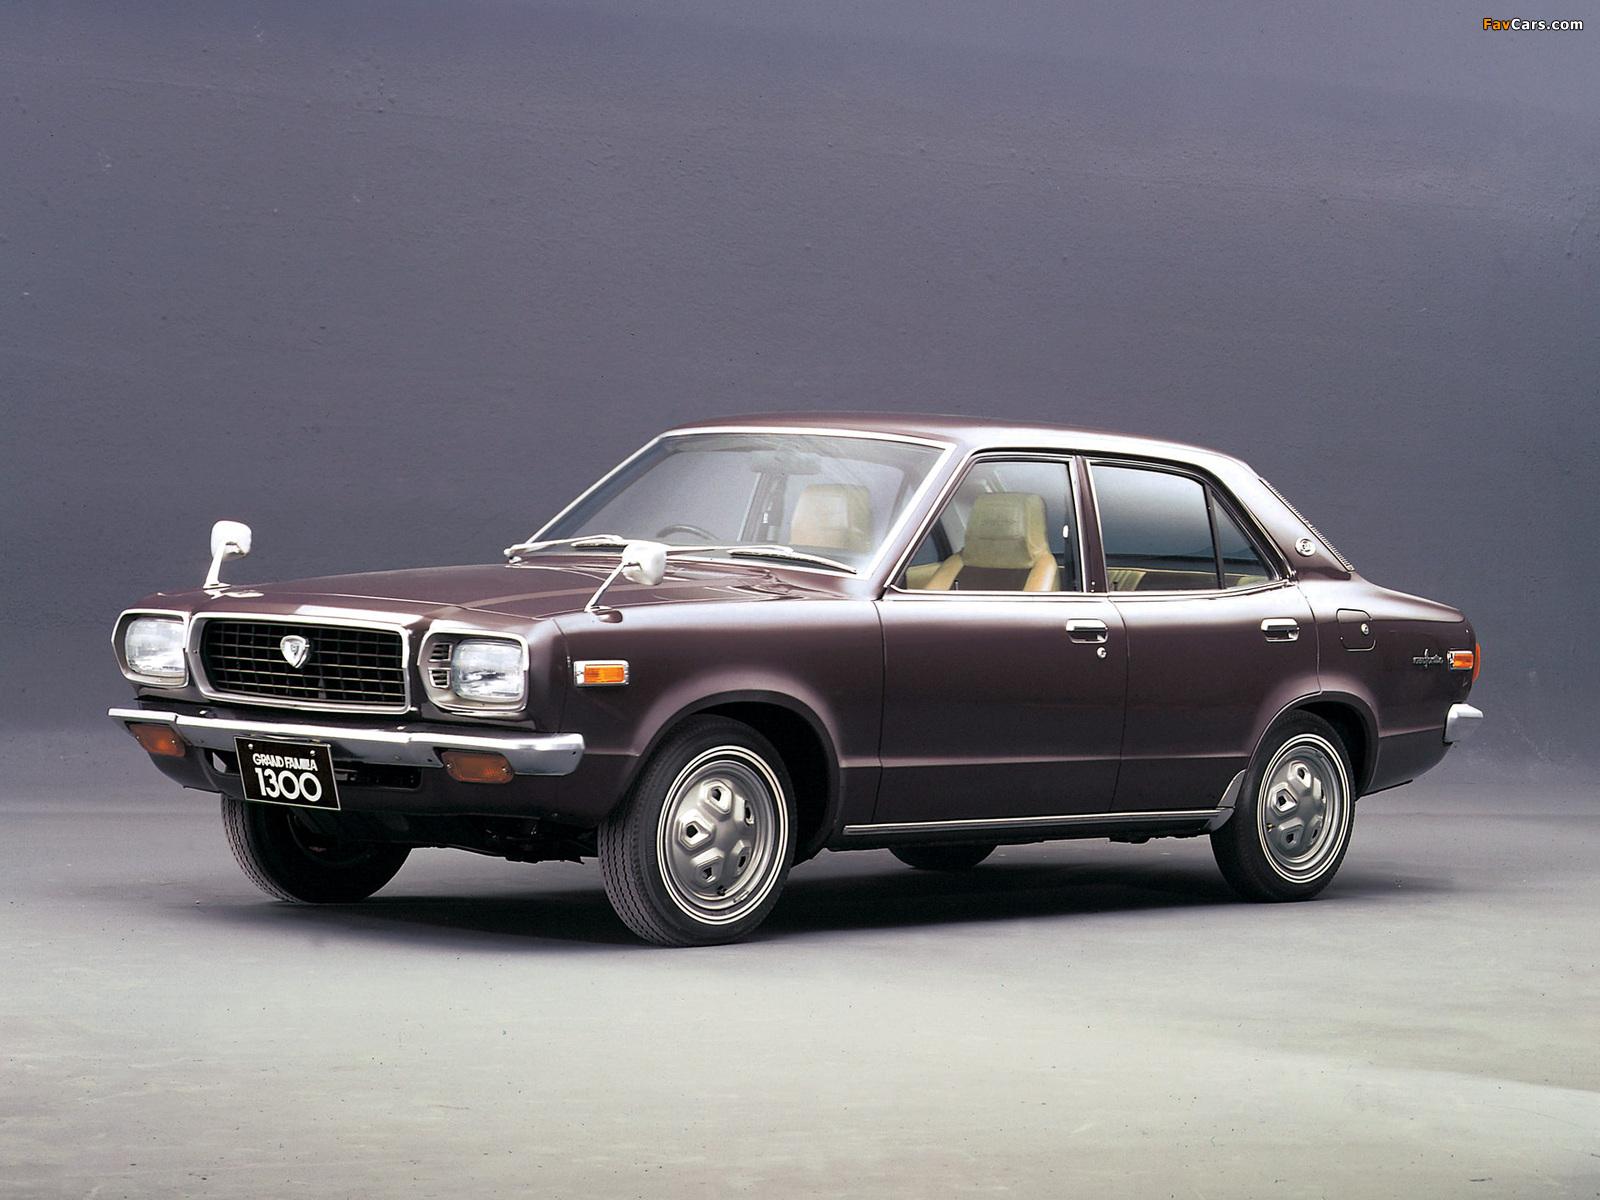 Mazda Grand Familia 1300 1971 images (1600 x 1200)